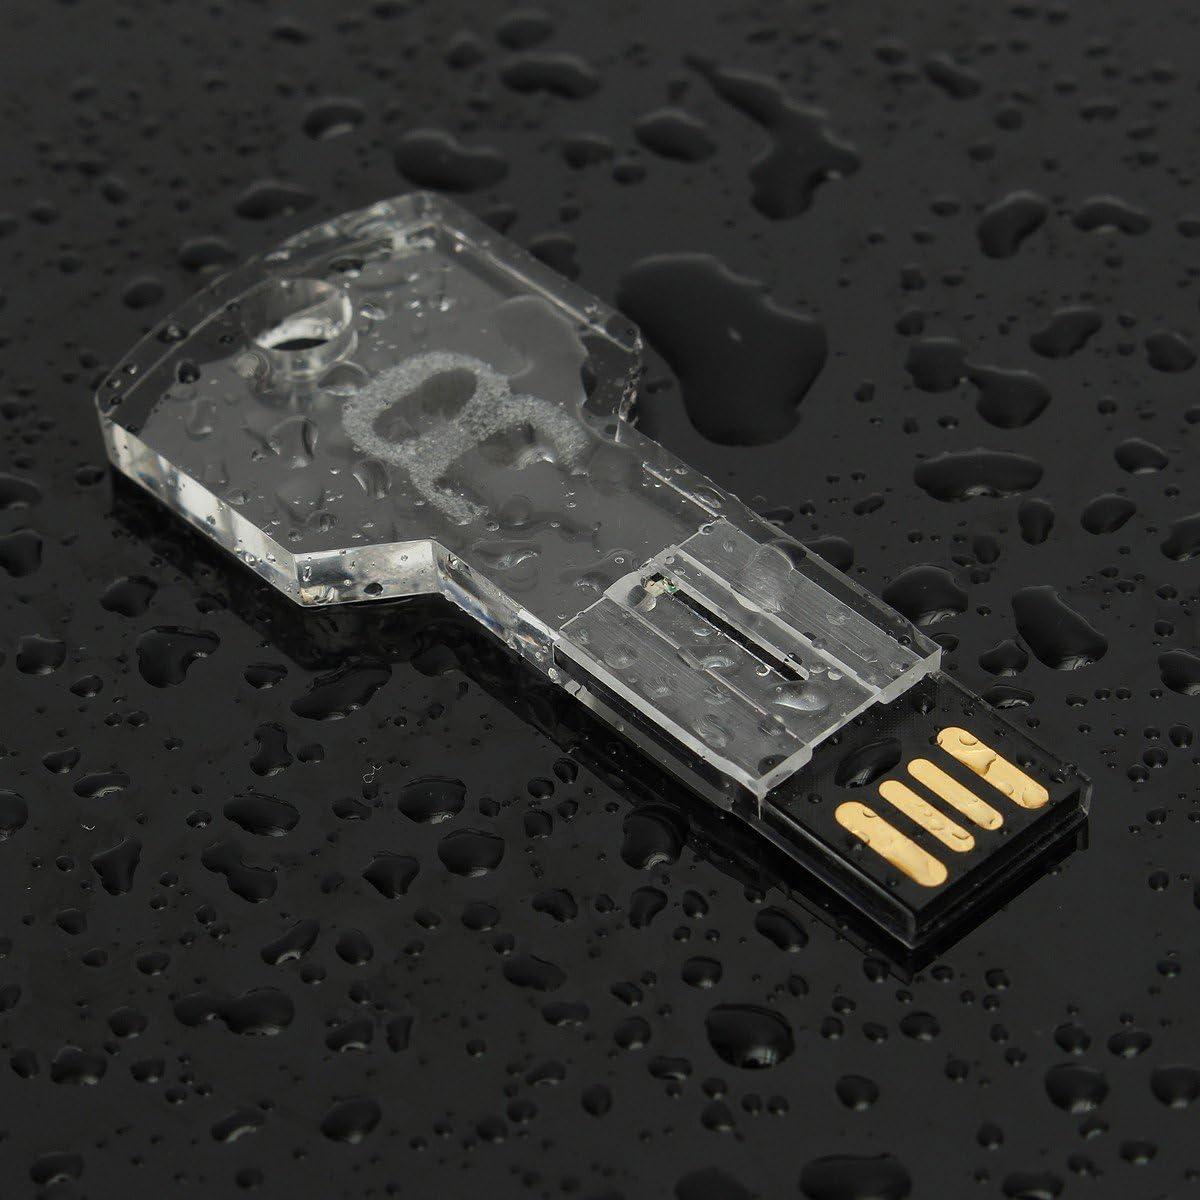 Amazon Com Usb Flash Drive Onchoice 16gb Usb 2 0 Memory Stick Led Thumb Drive Crystal Transparent Blue Key Shape Computers Accessories